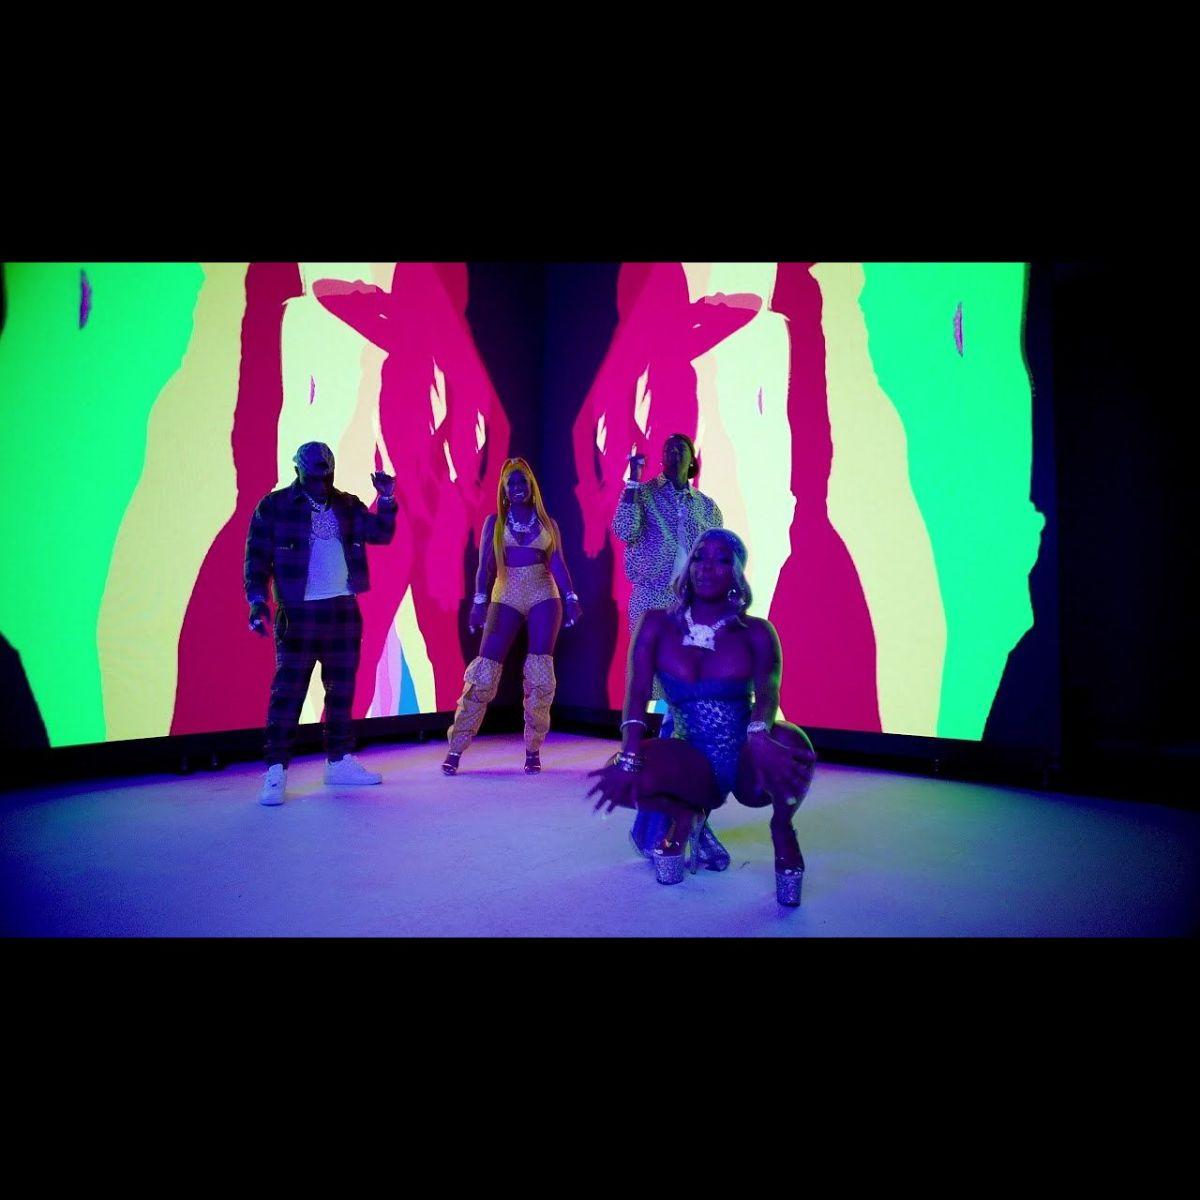 Moneybagg Yo - Said Sum (Remix) (ft. City Girls and DaBaby) (Thumbnail)